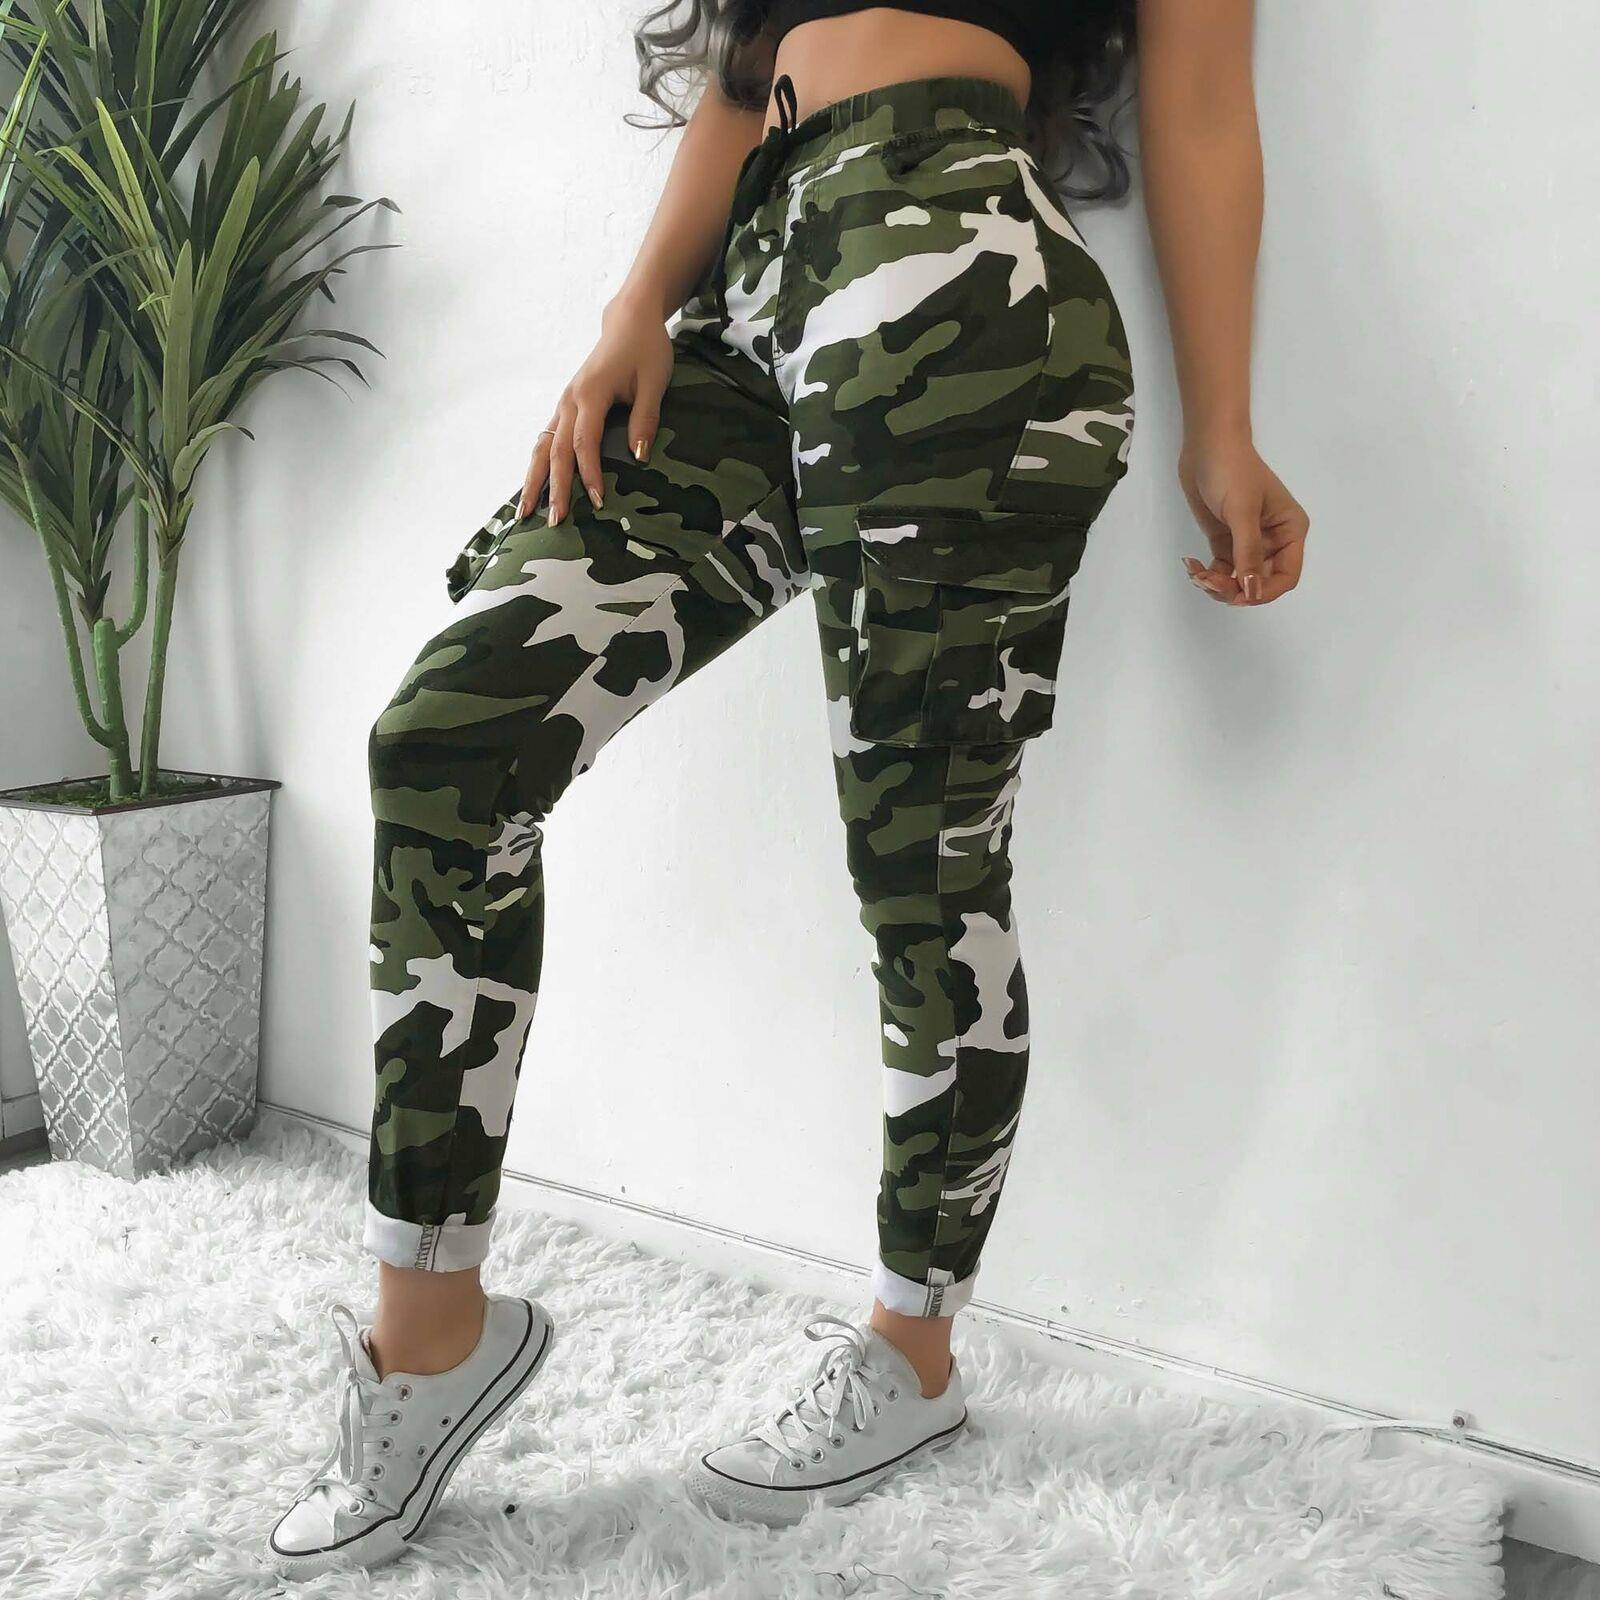 NUOVA linea donna Donna Mimetica Esercito Rose Stampa Pantaloni Denim Jeans skinny pants